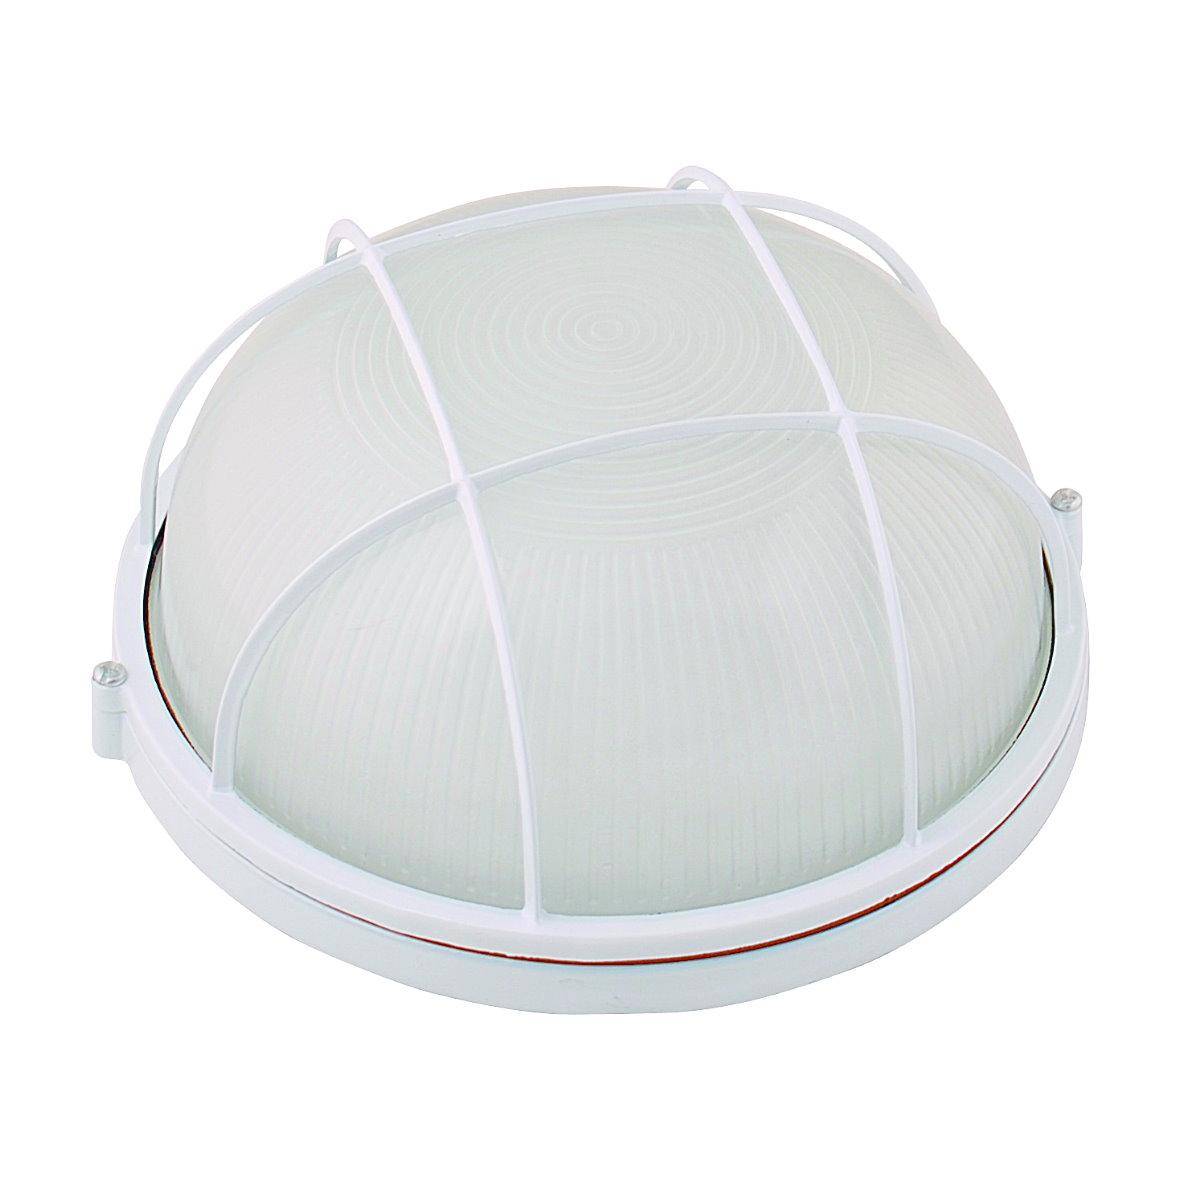 aluminium kellerleuchte kellerlampe bulkhead ip54 keller lampe leuchte aussen ebay. Black Bedroom Furniture Sets. Home Design Ideas